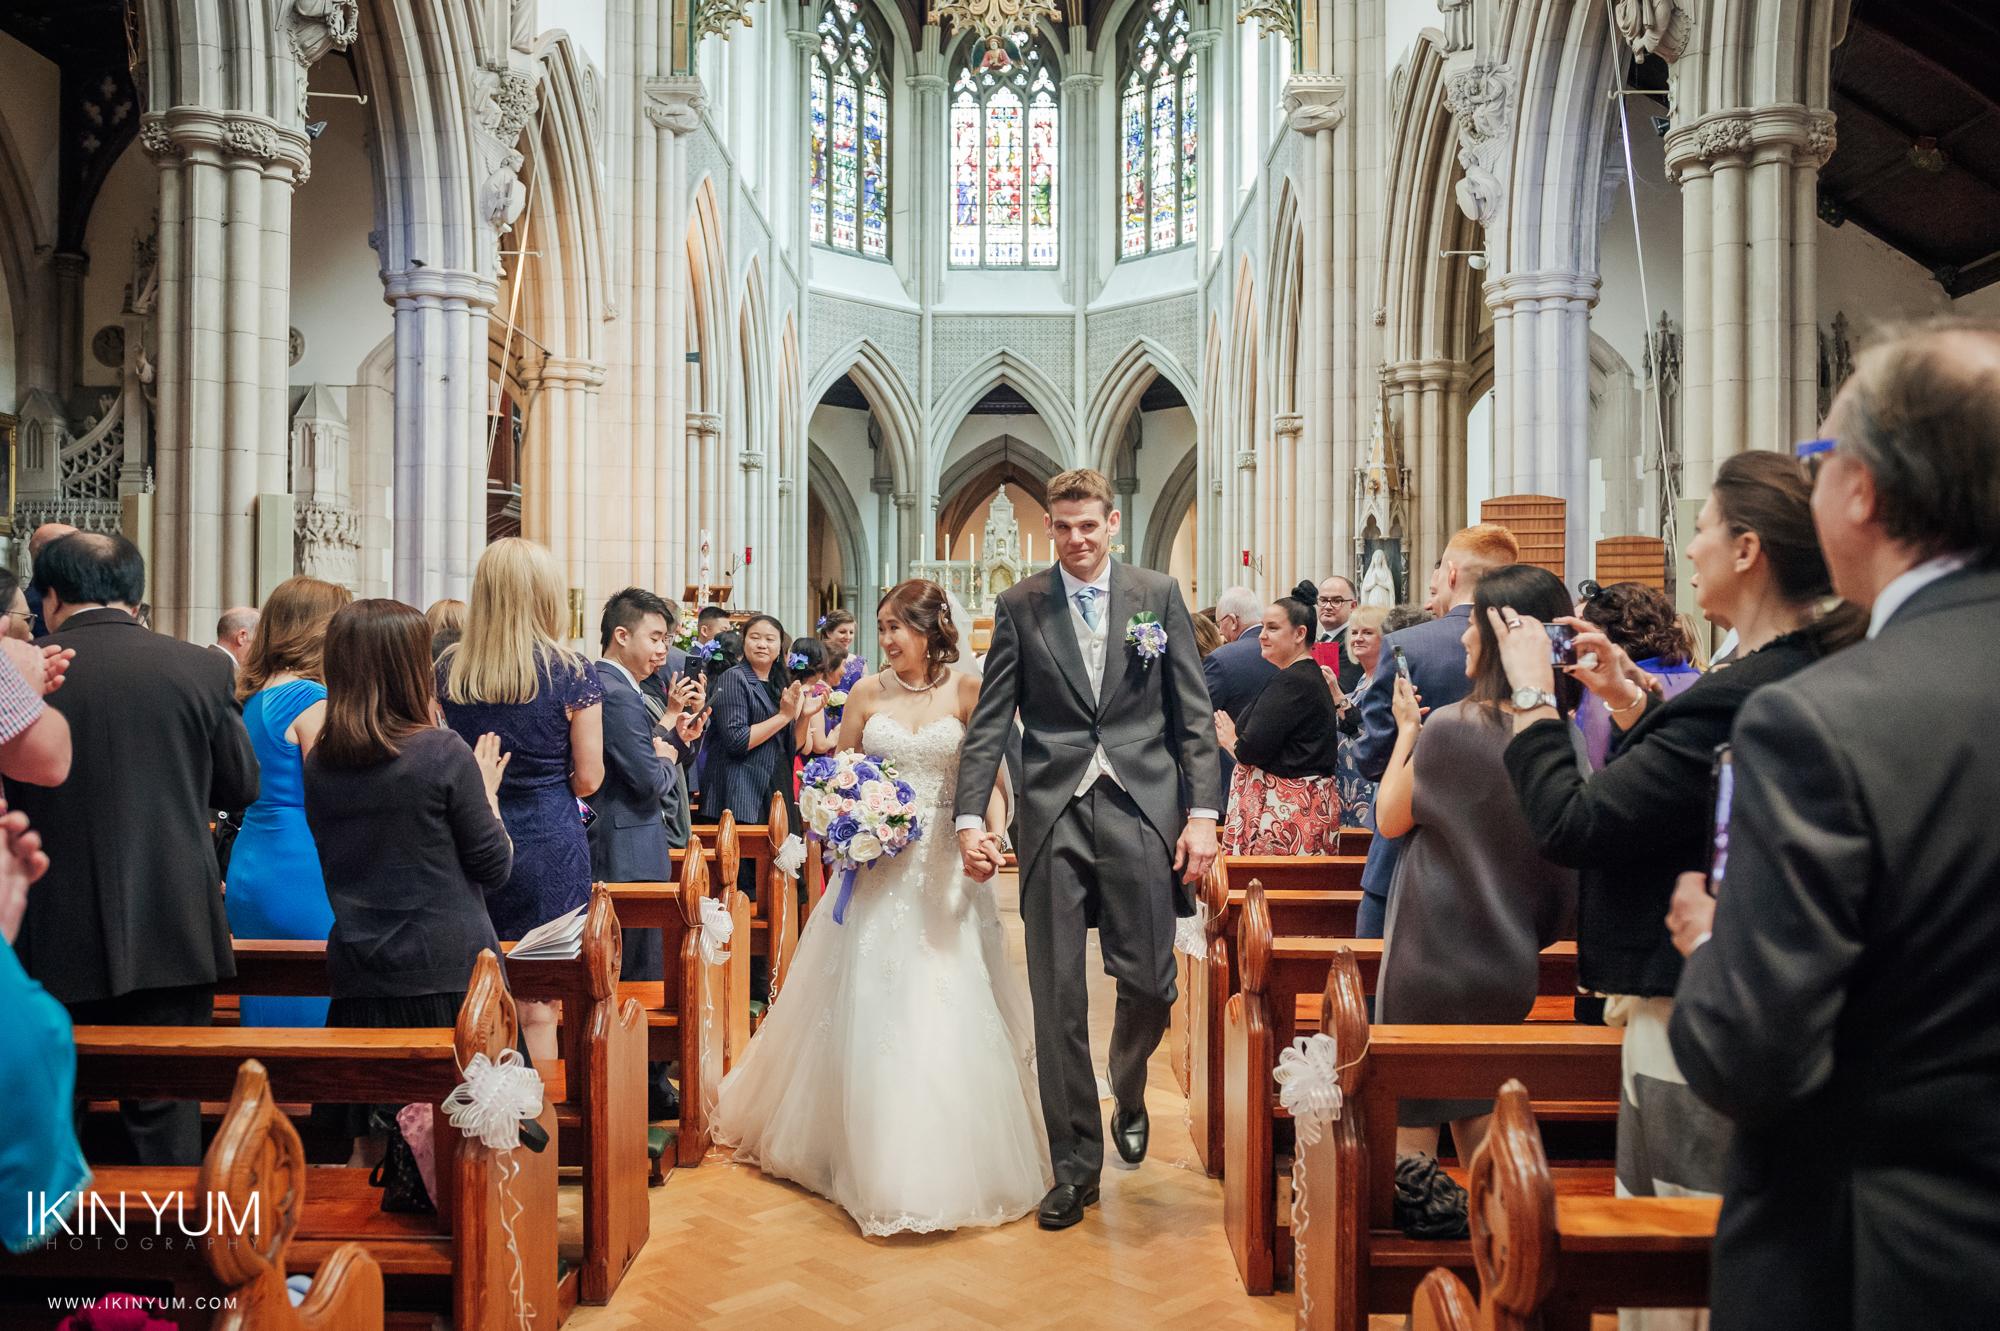 Teresa & Johnathan Weddong Day - The Ceremony-0179.jpg